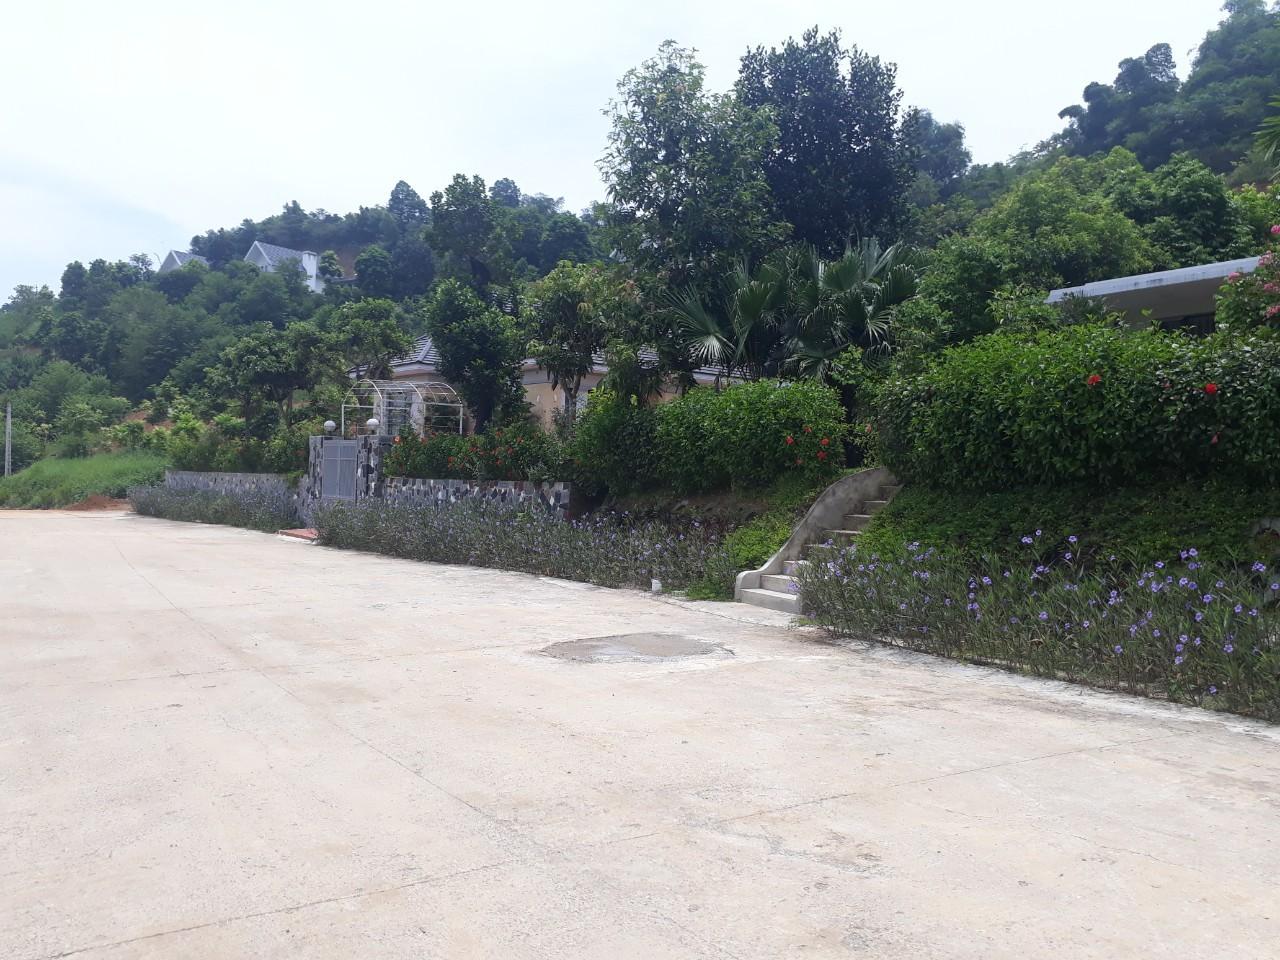 tien-do-thi-cong-panorama-hill-hoa-binh